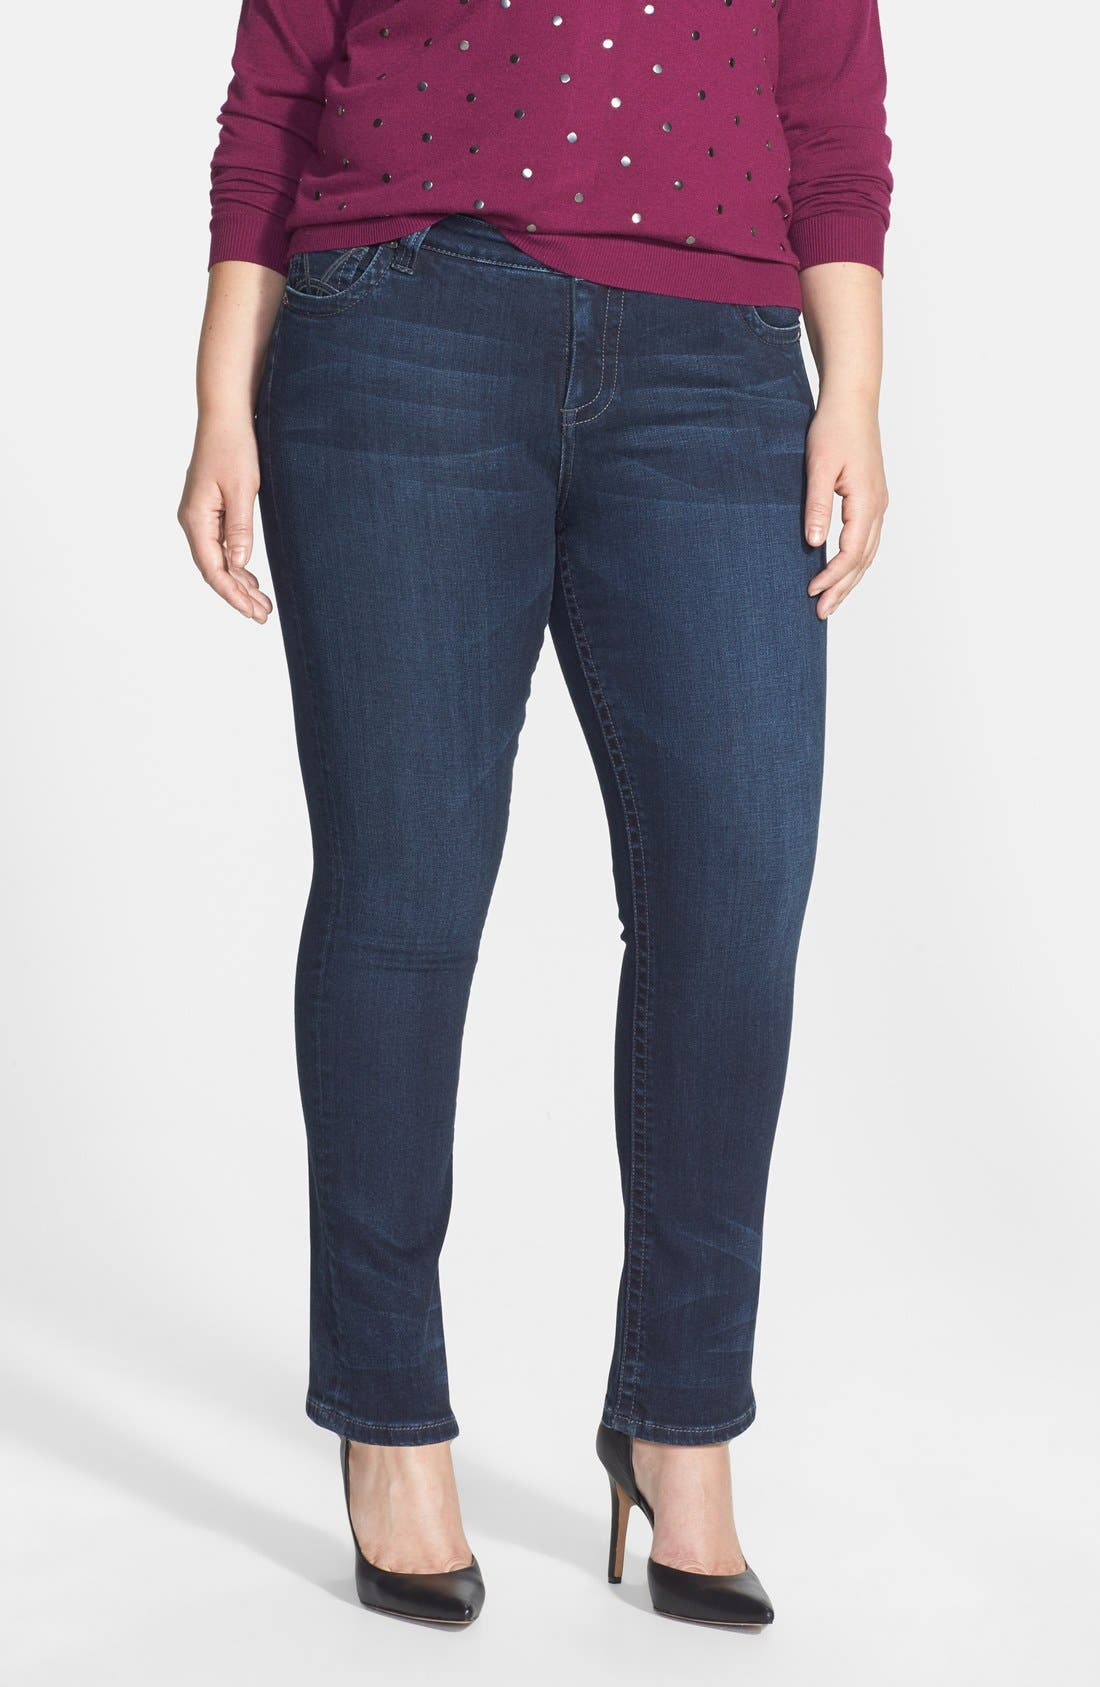 Alternate Image 1 Selected - KUT from the Kloth 'Stevie' Straight Leg Jeans (Progressive) (Plus Size) (Online Only)